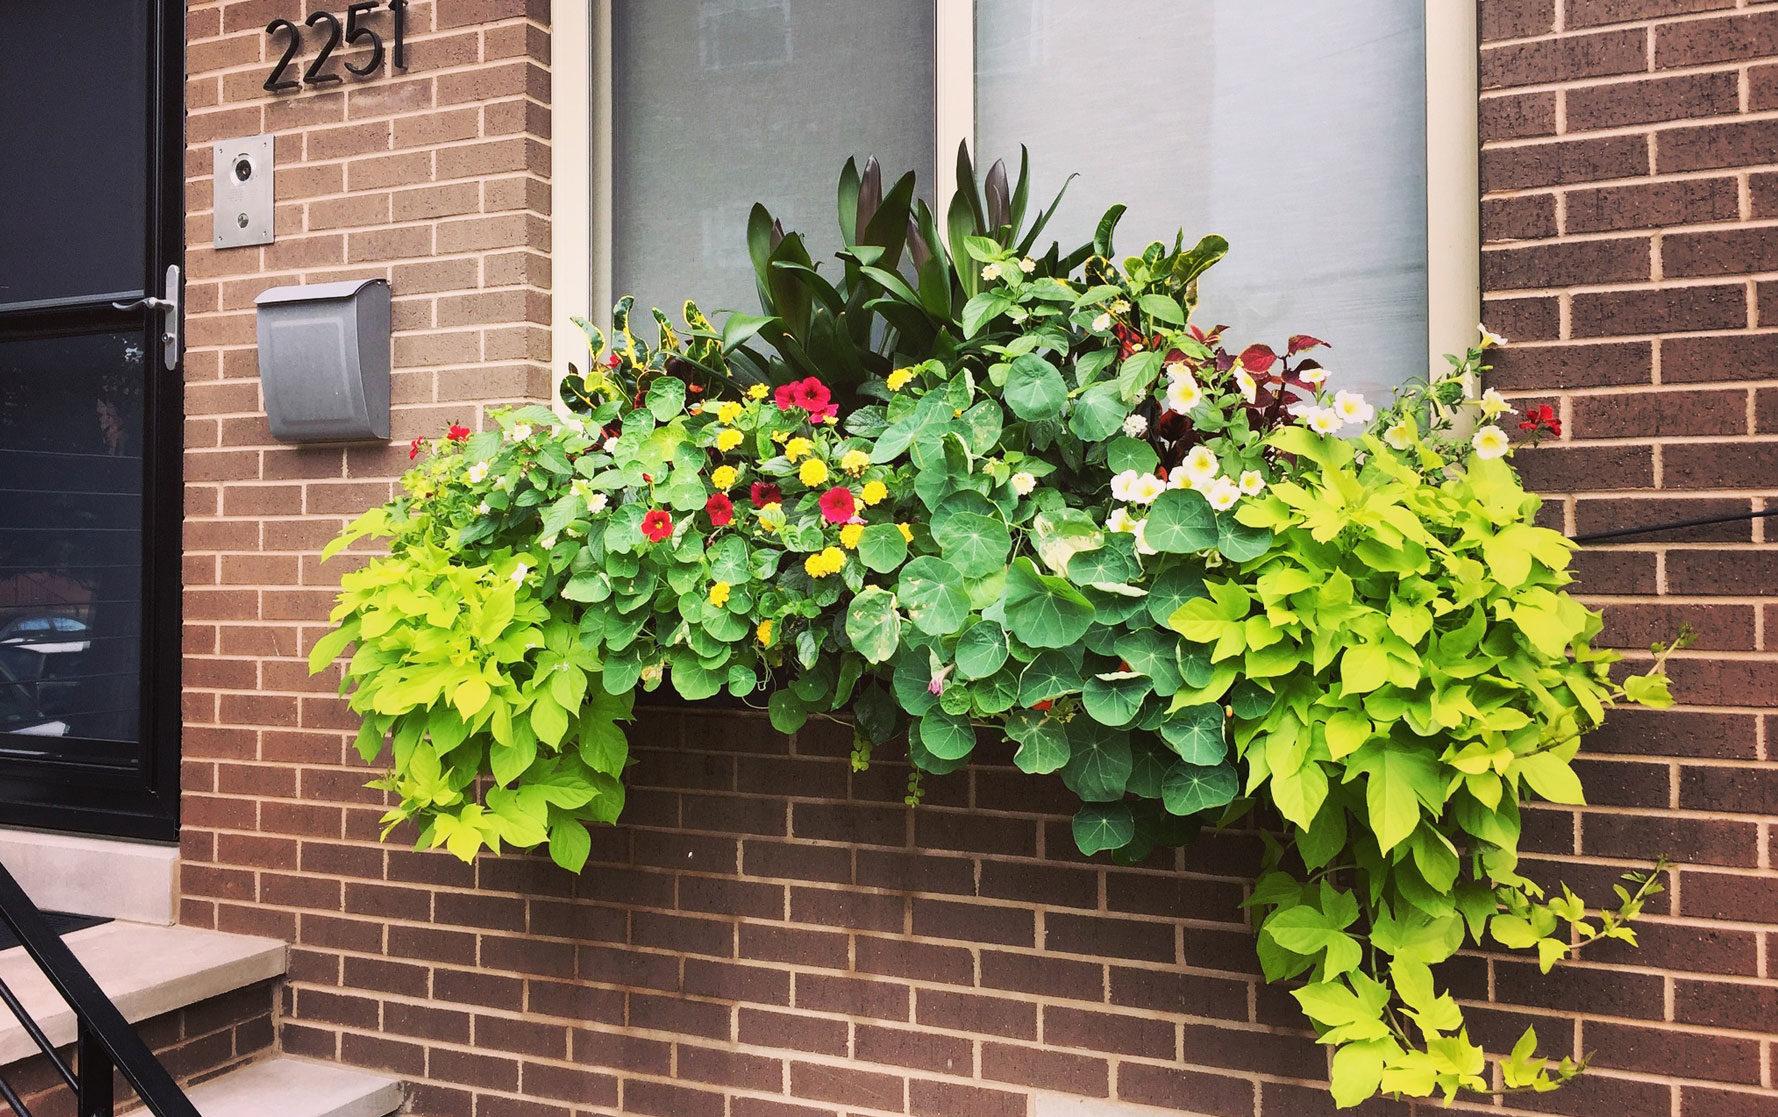 Front Window Box Summer Arrangement with Green Plants